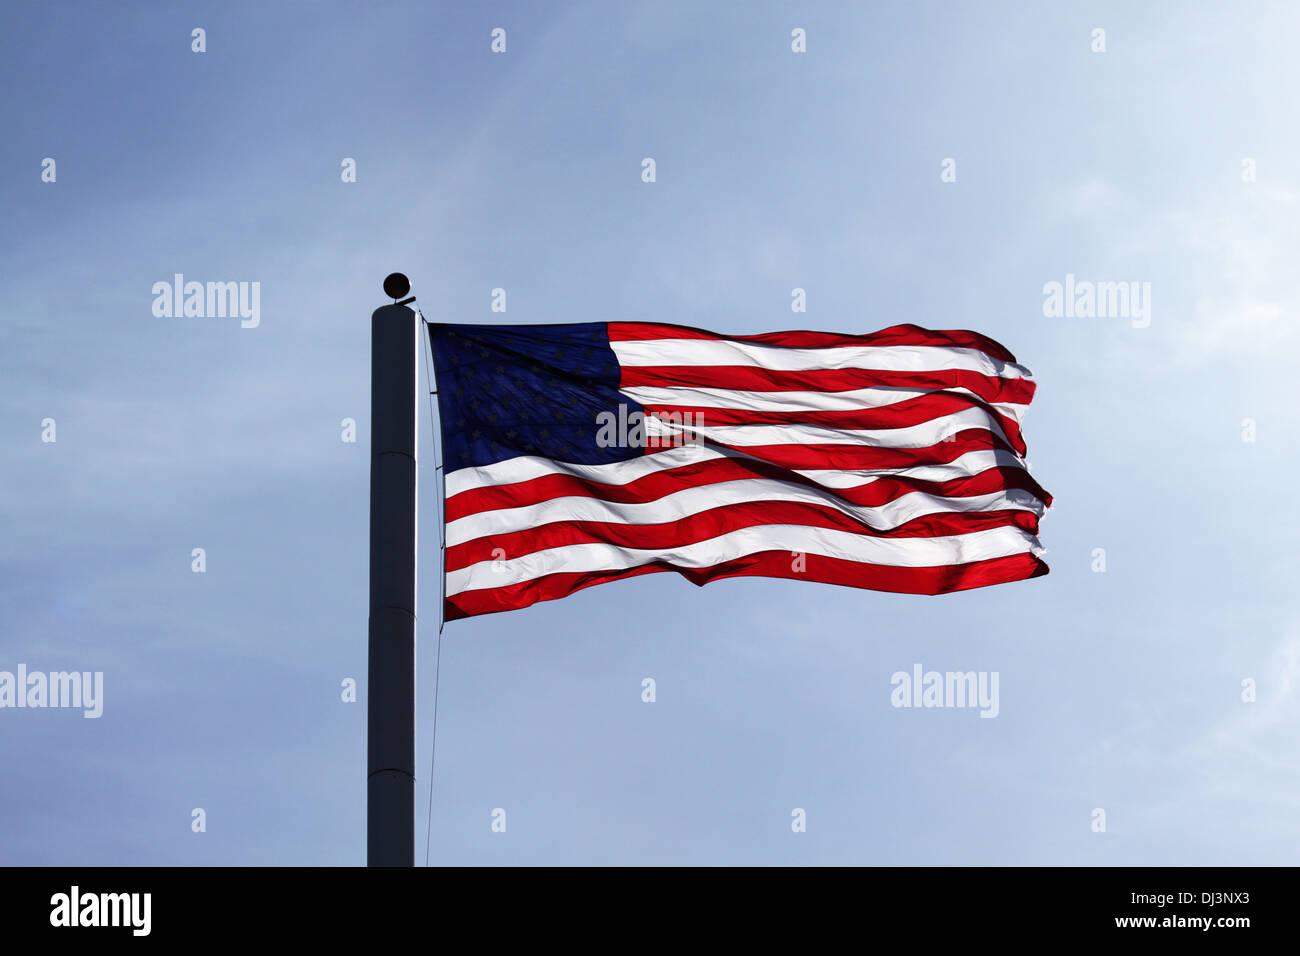 Waving American Flag on A Flagpole - Stock Image